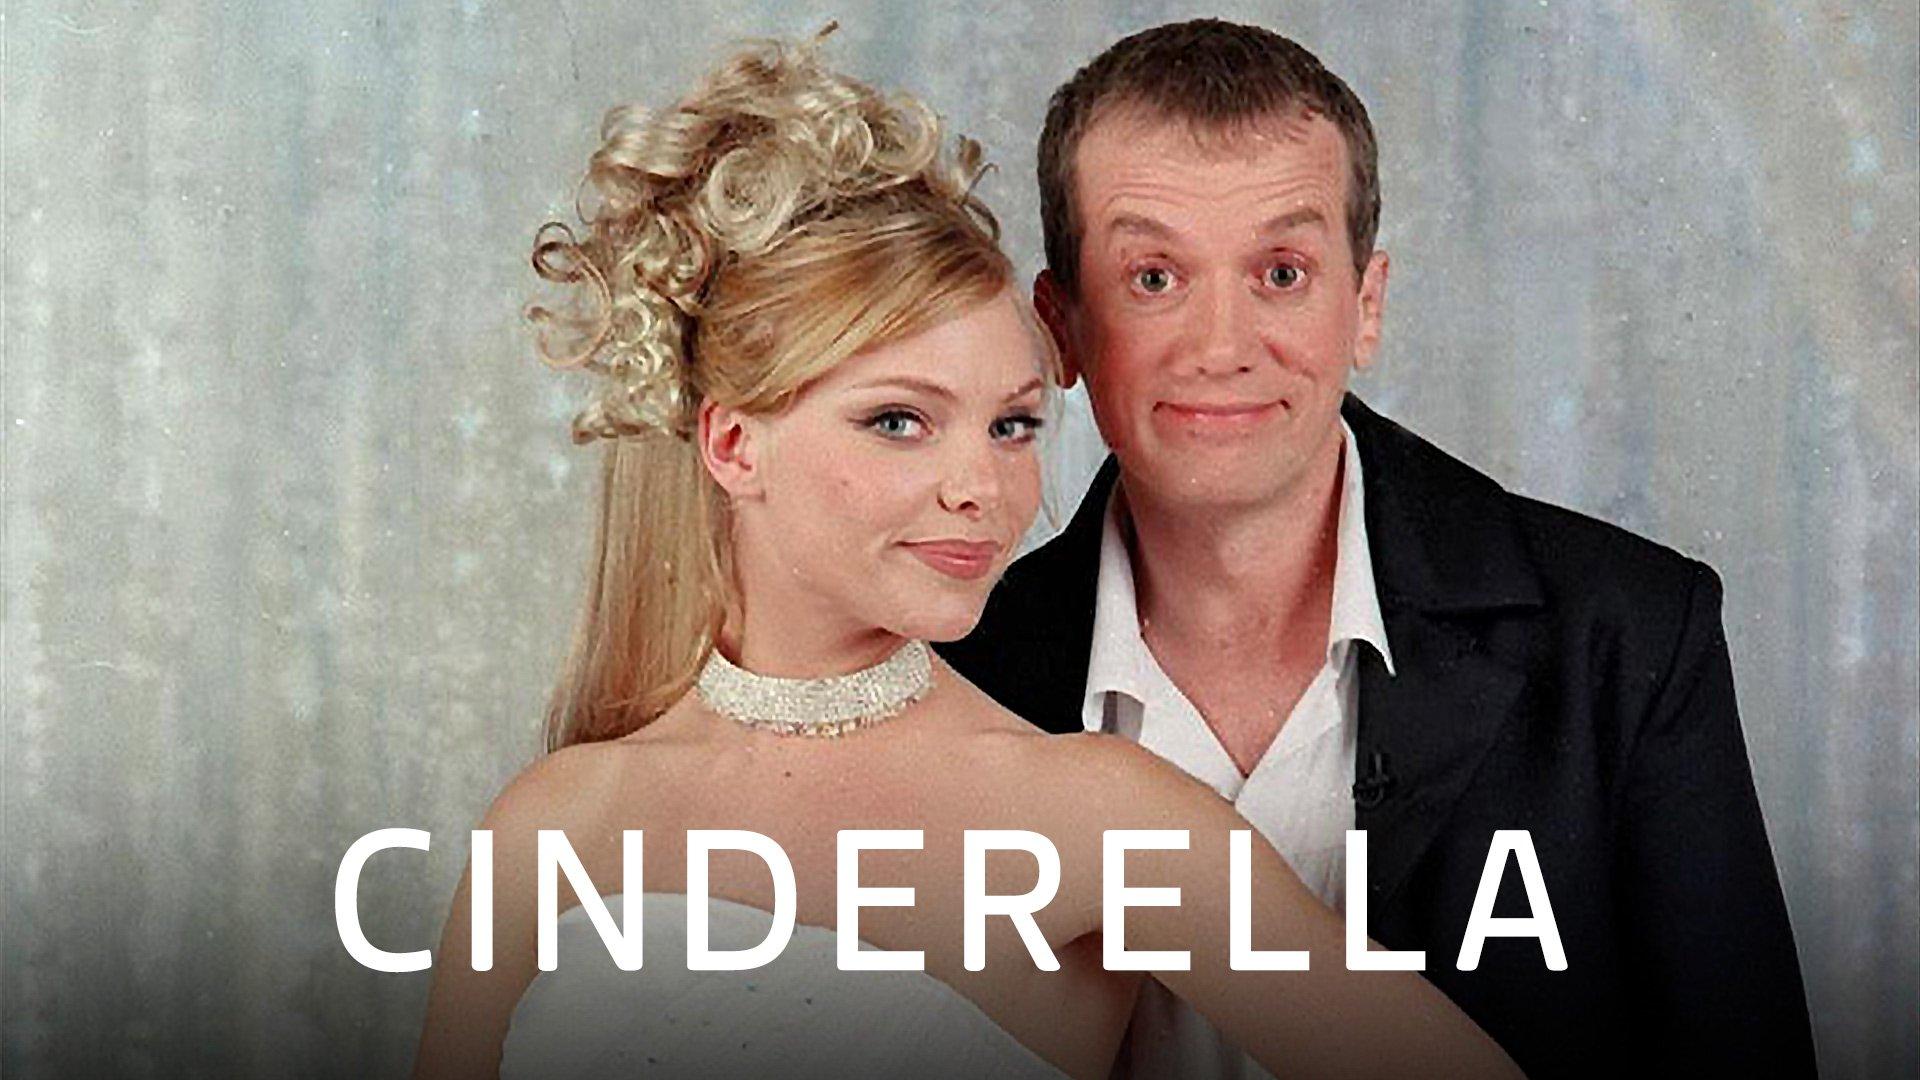 Cinderella on BritBox UK